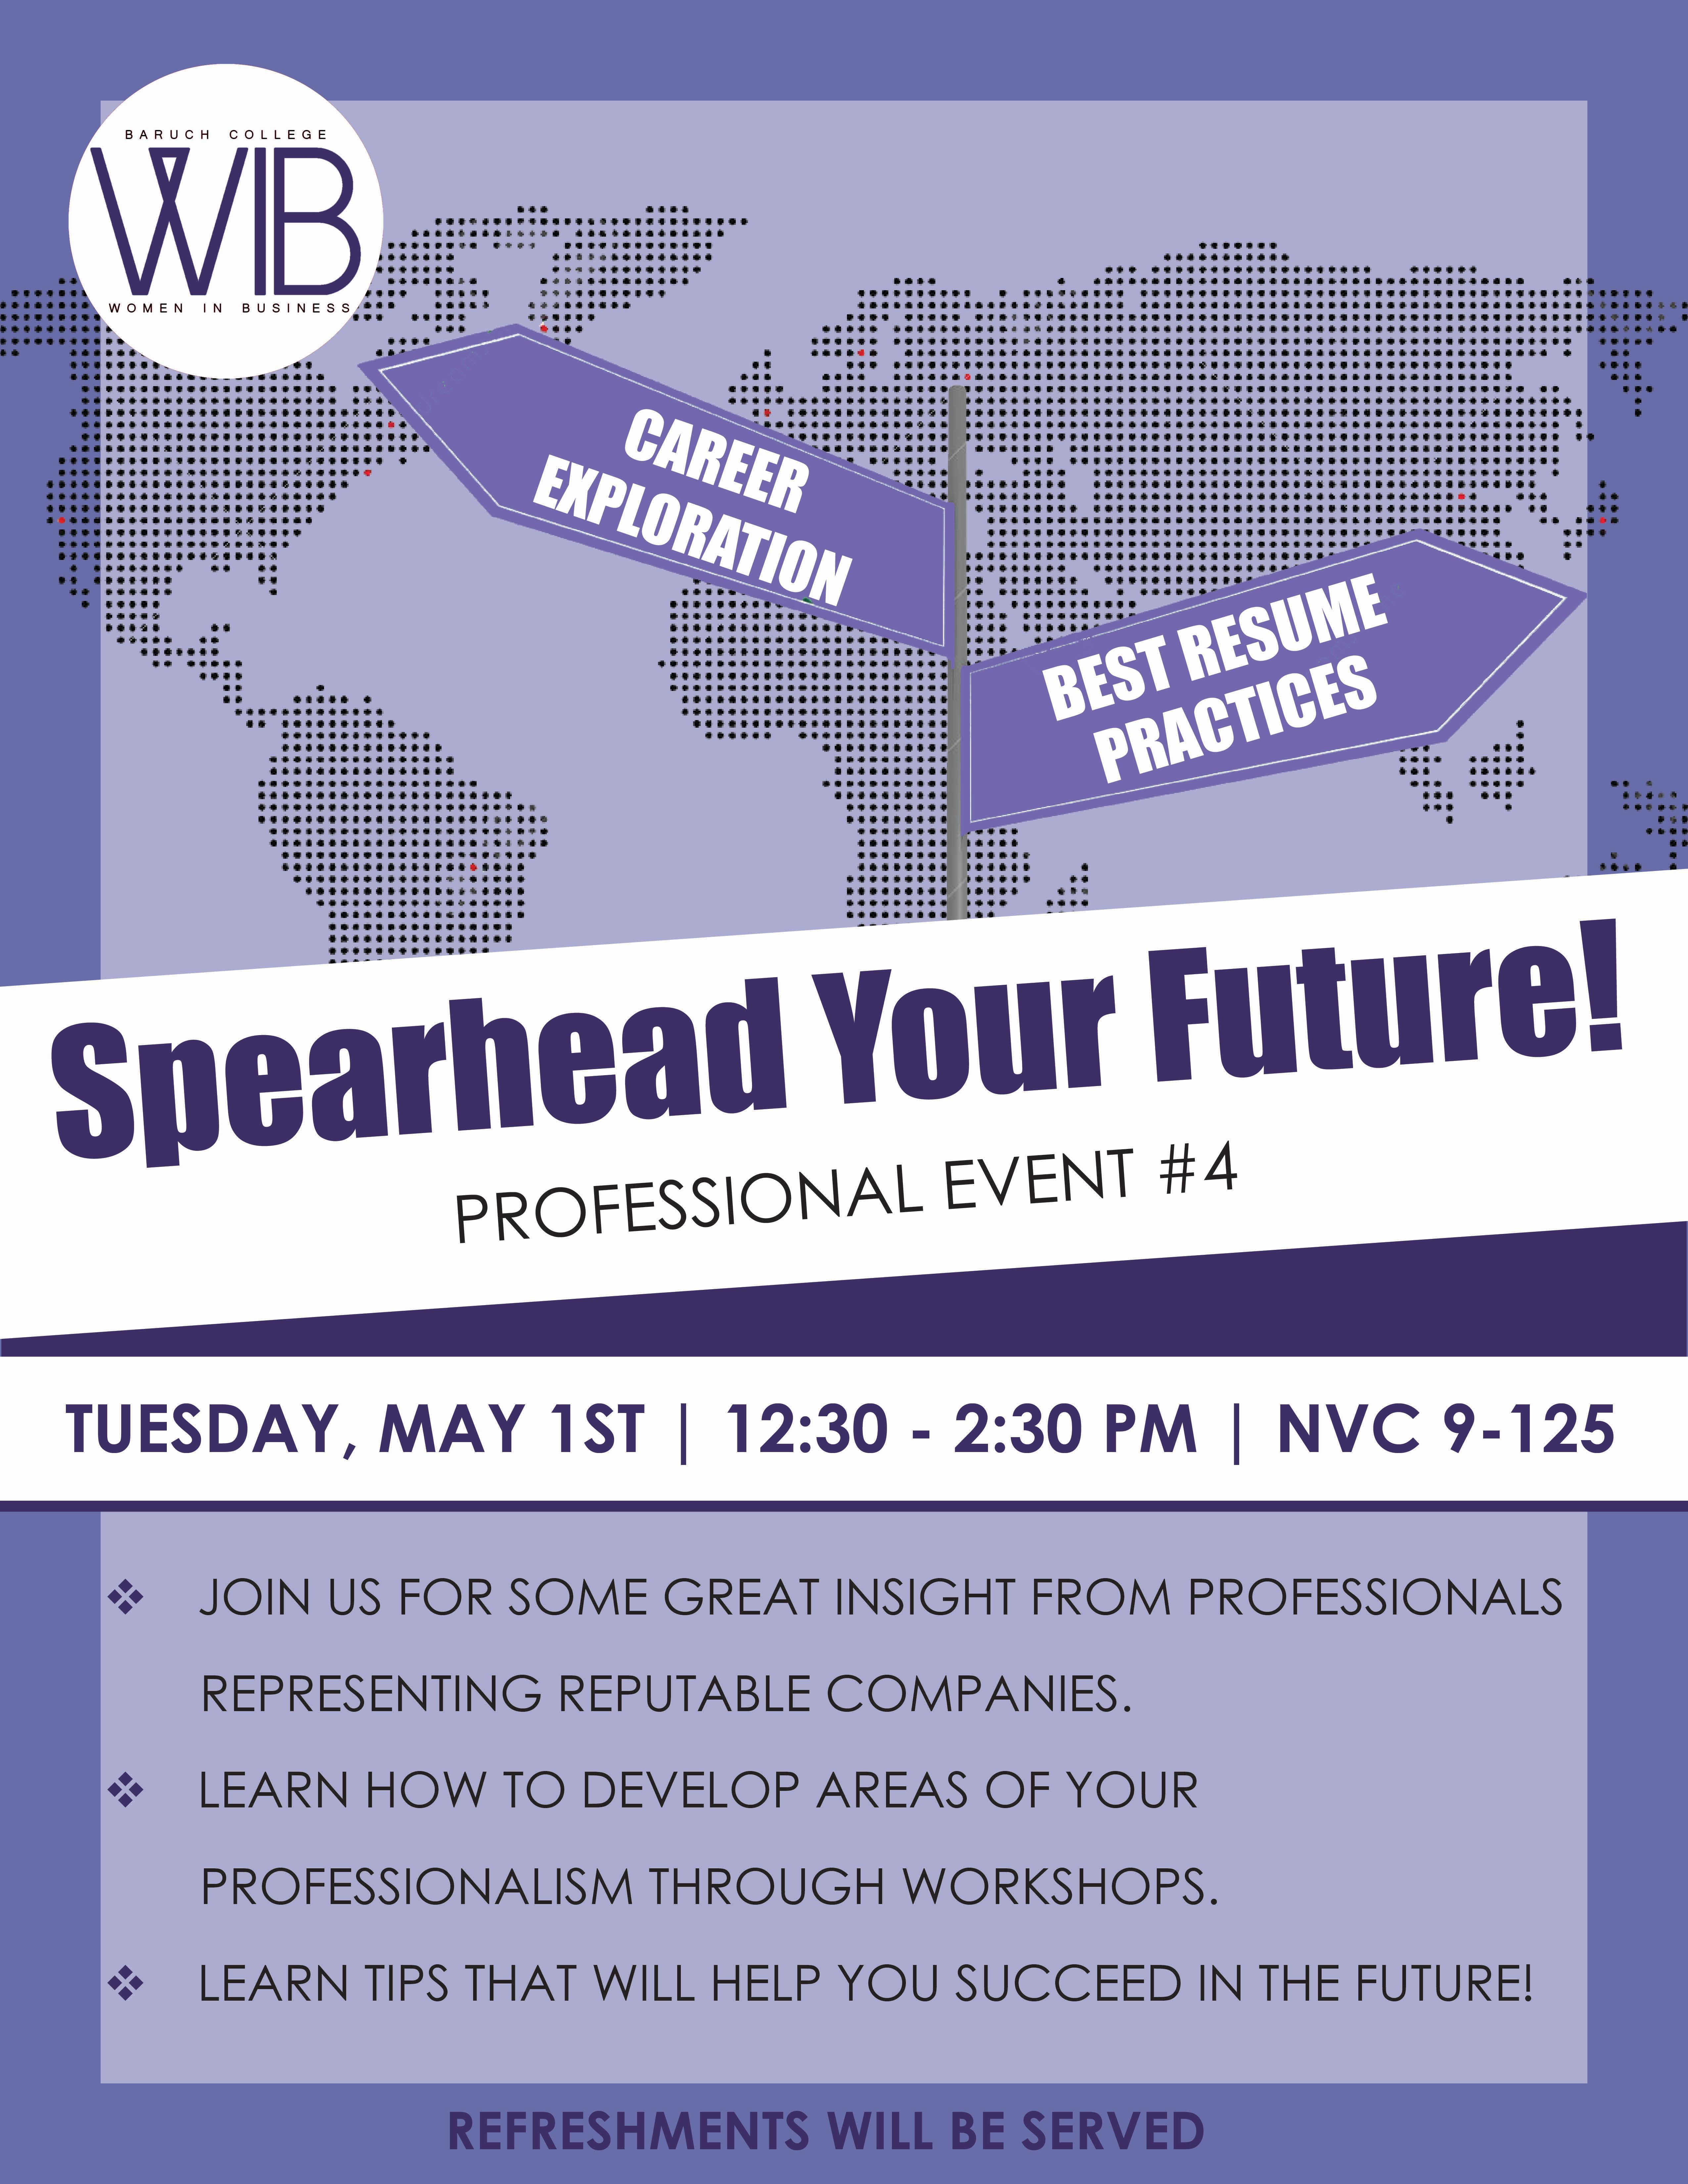 Spearhead Your Future!